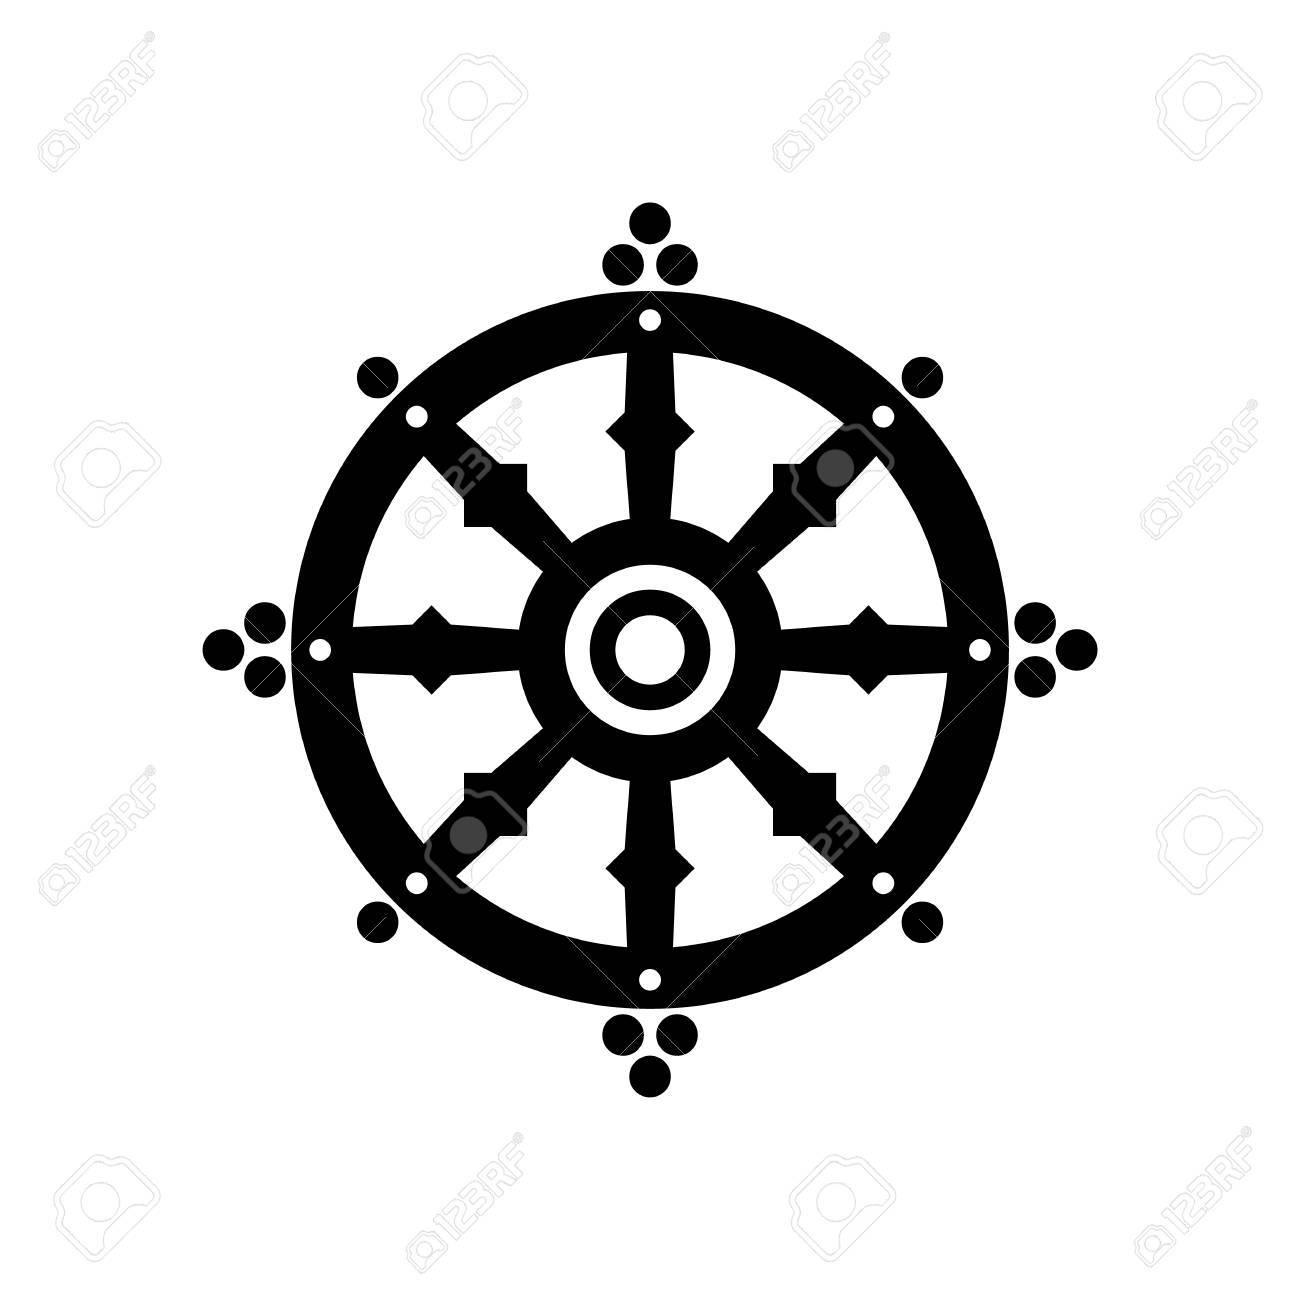 Dharma Wheel Of Fortune, Spirituality, B-Dharma wheel of fortune, spirituality, Buddhism religious symbol. Vector  illustration Stock Vector --11